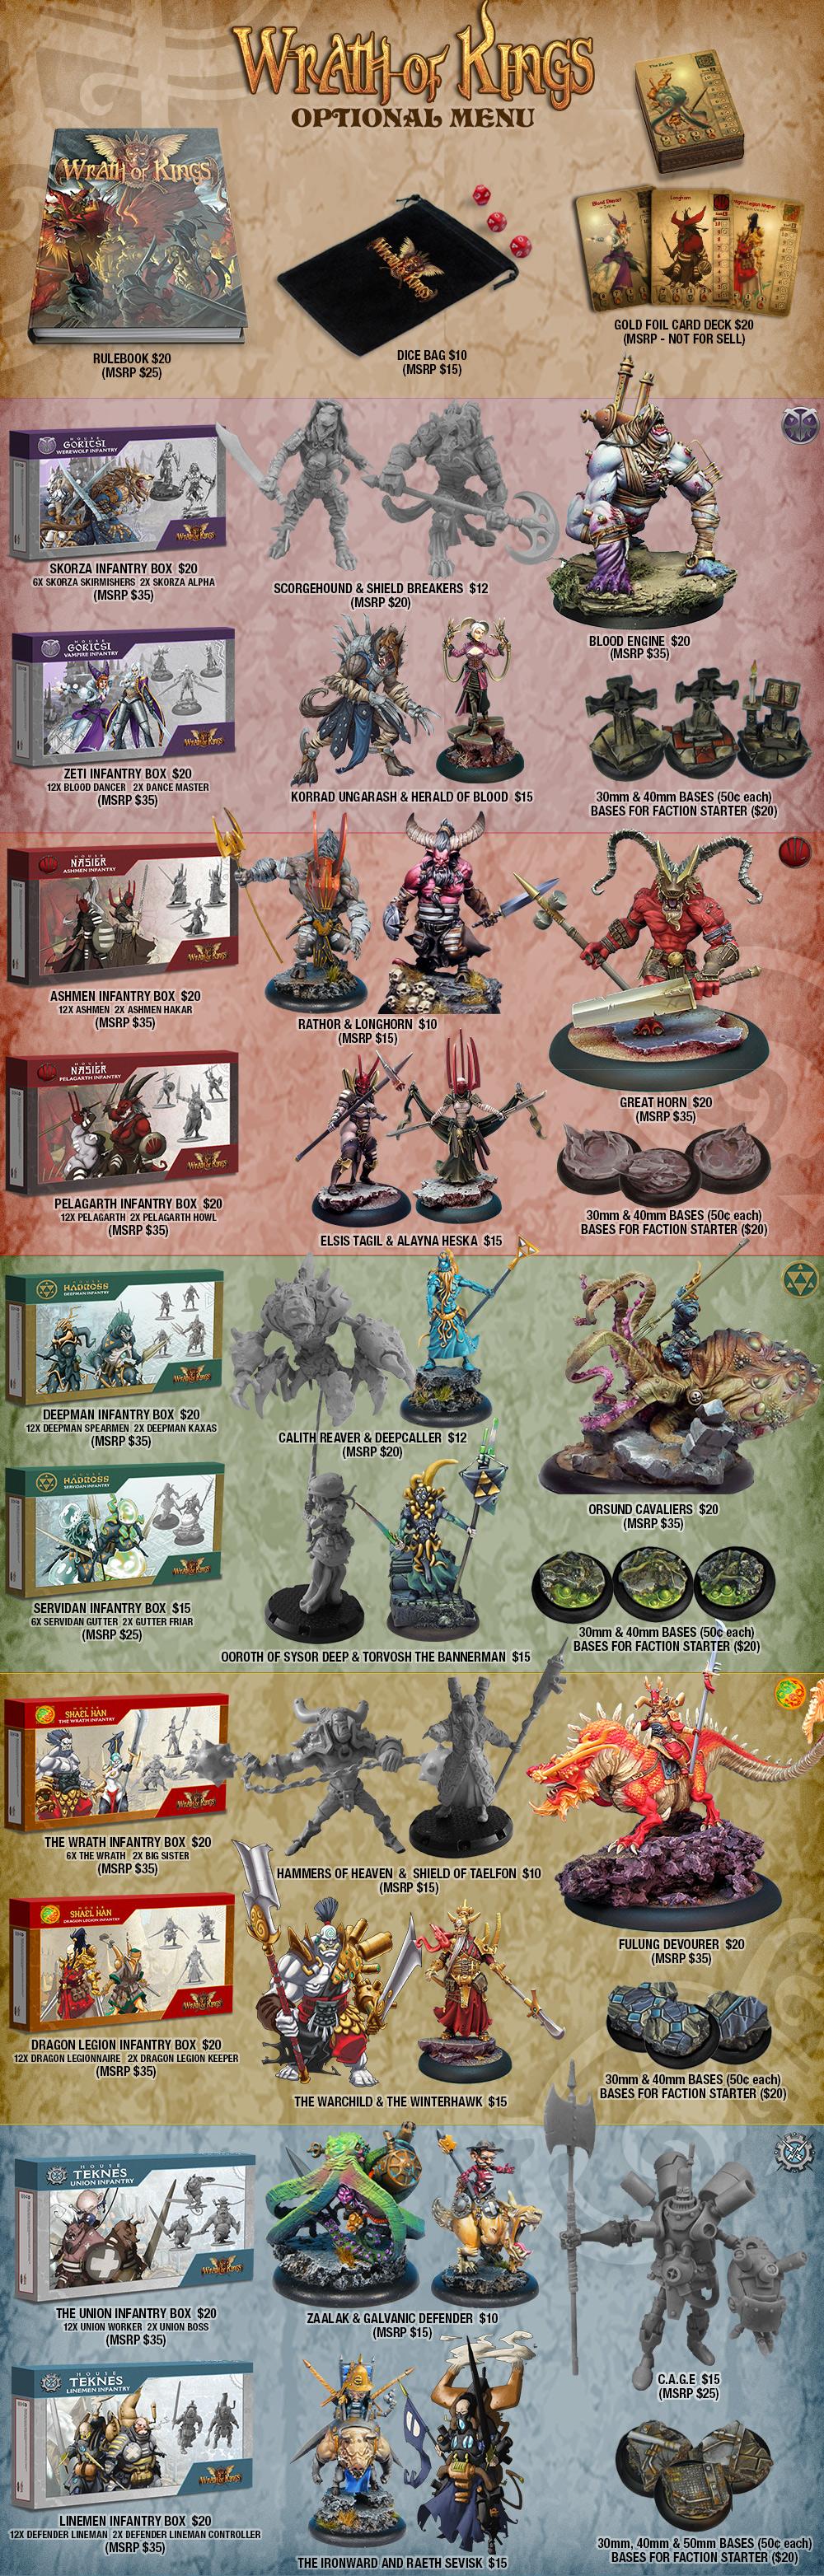 Wrath of King WOK_optional_menu-rank2